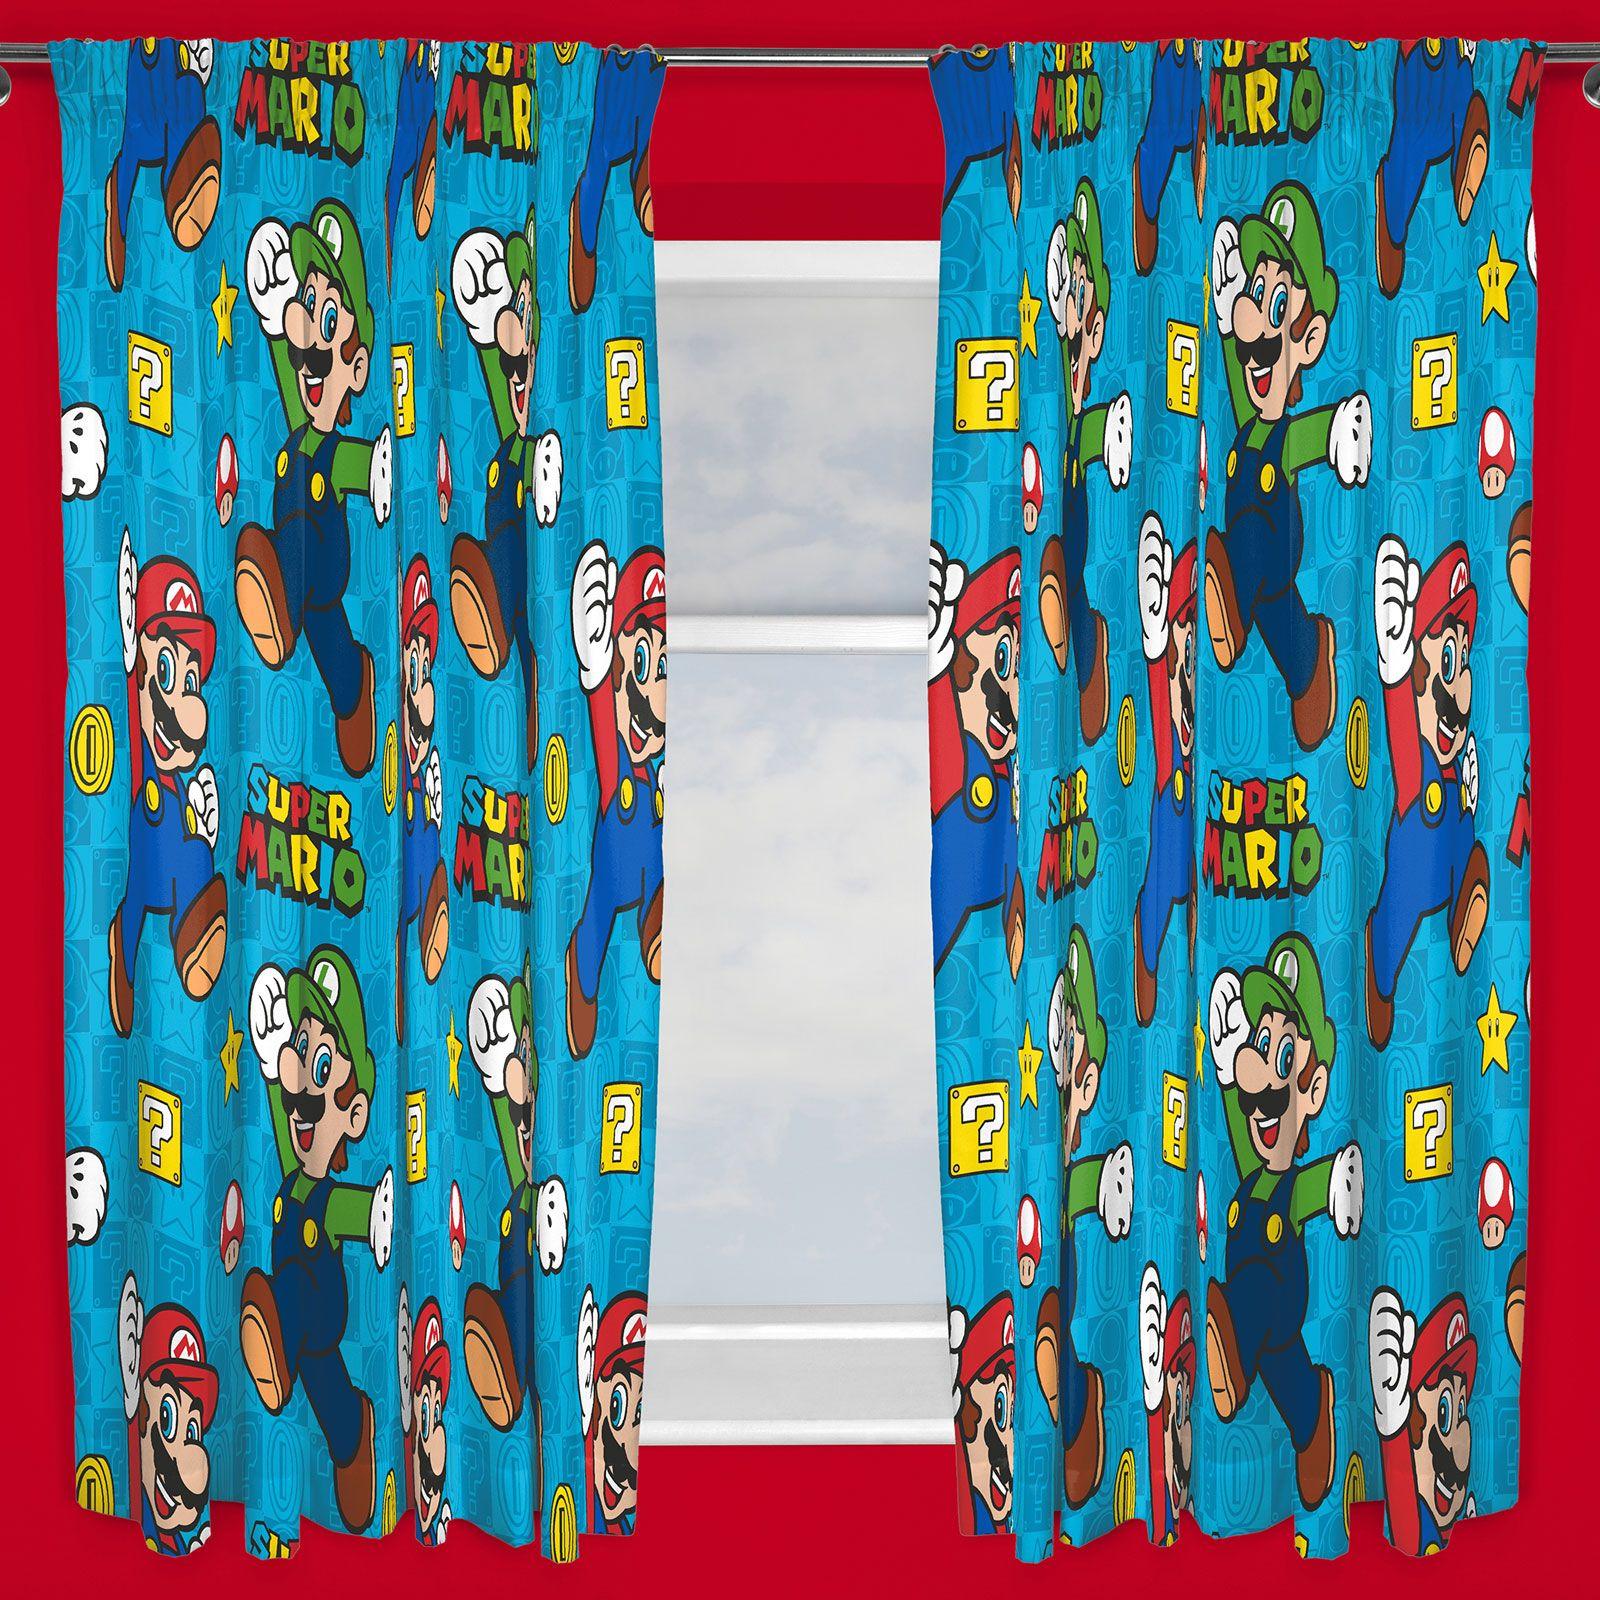 Super Mario Bedroom Official Nintendo Super Mario Brothers Bedding Duvet Cover Sets